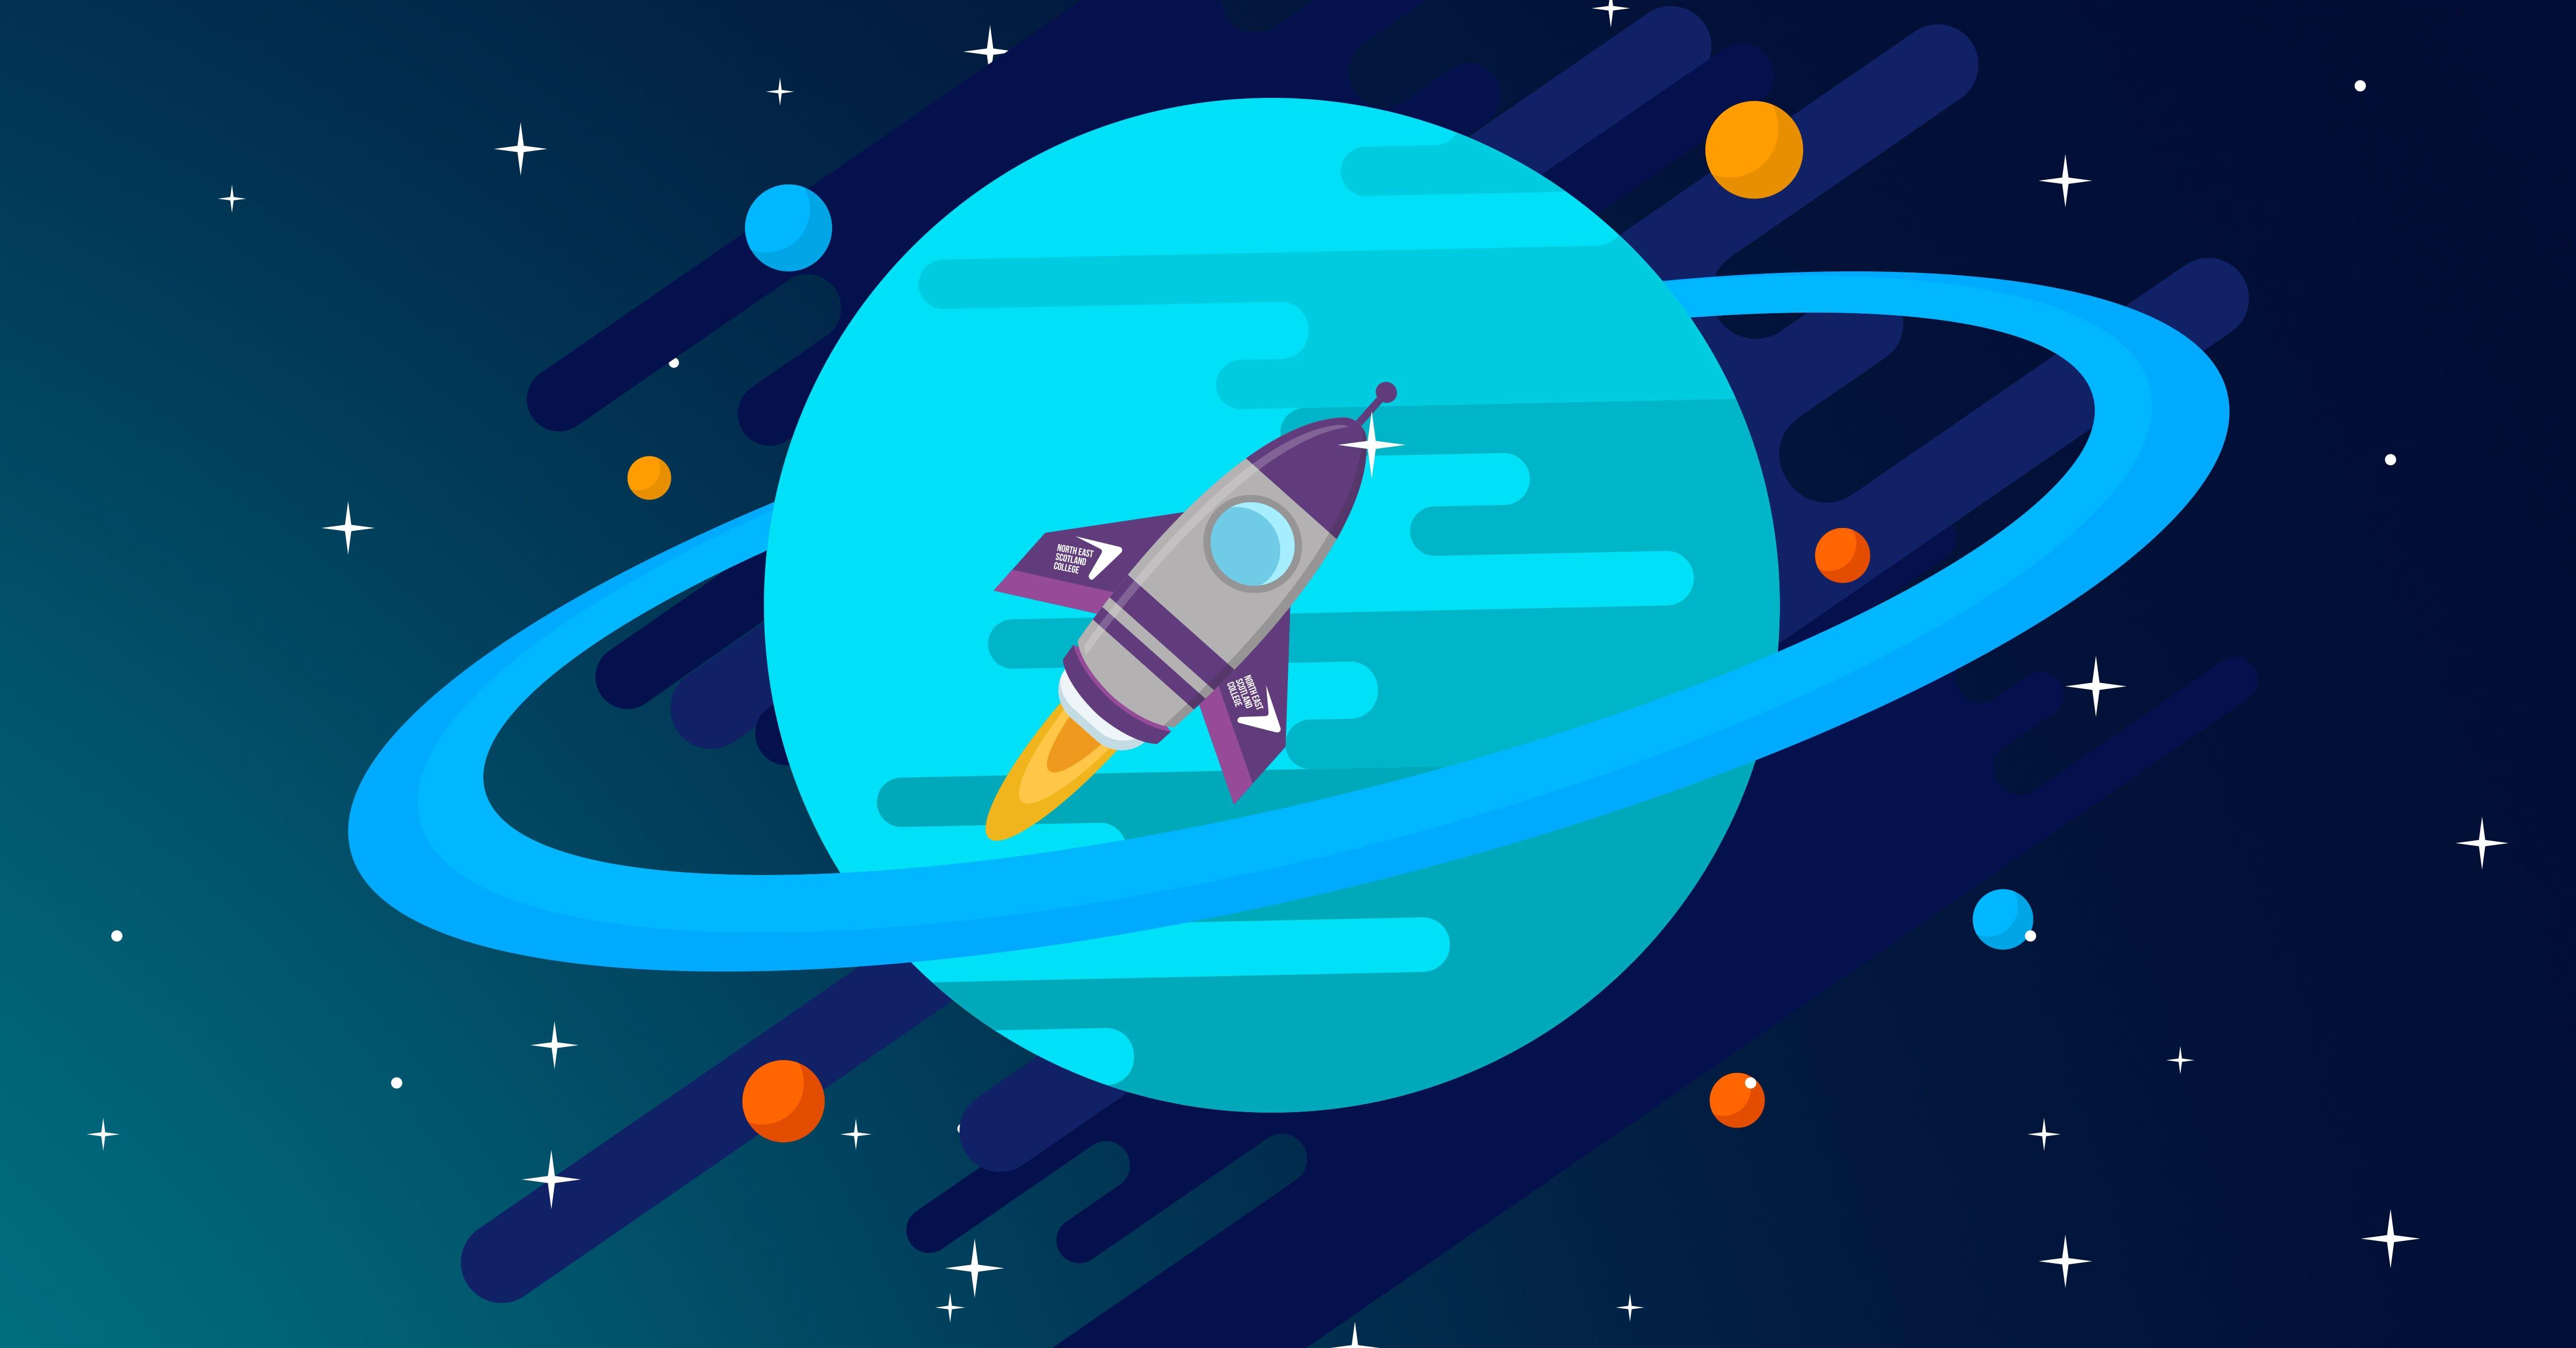 NESCol's Galactic Journey